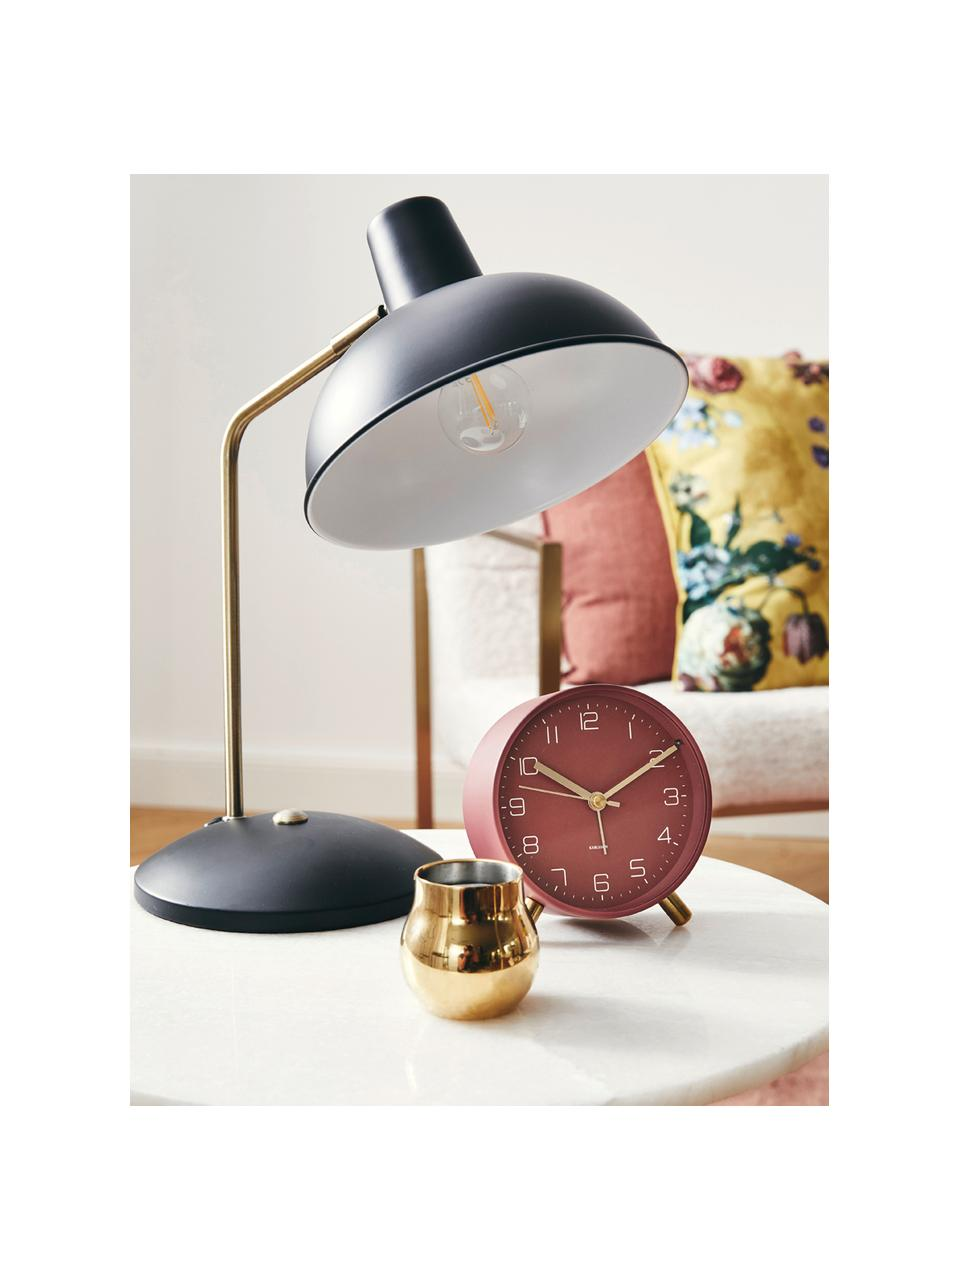 Lampada da tavolo retrò Hood, Paralume: metallo verniciato, Base della lampada: metallo verniciato, Lampada: nero, ottonato Paralume interno: bianco, Larg. 20 x Alt. 38 cm